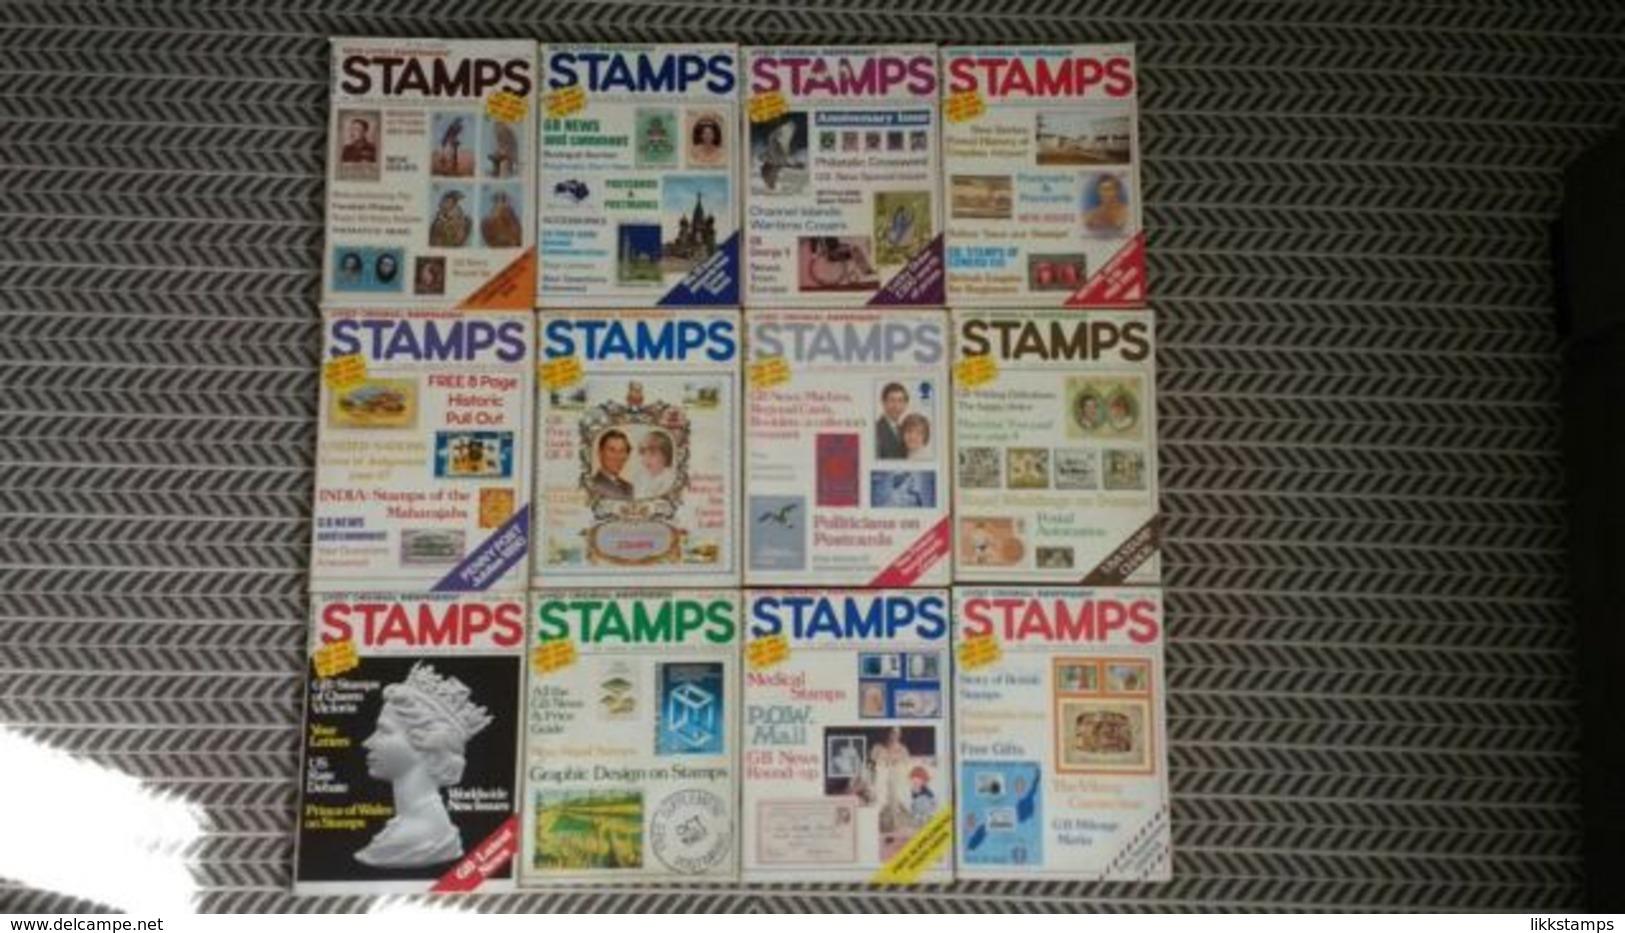 STAMPS MAGAZINE JANUARY 1981 TO DECEMBER 1981 (VOLUME 1 No. 11 TO VOLUME 2 No. 10) - Inglesi (dal 1941)